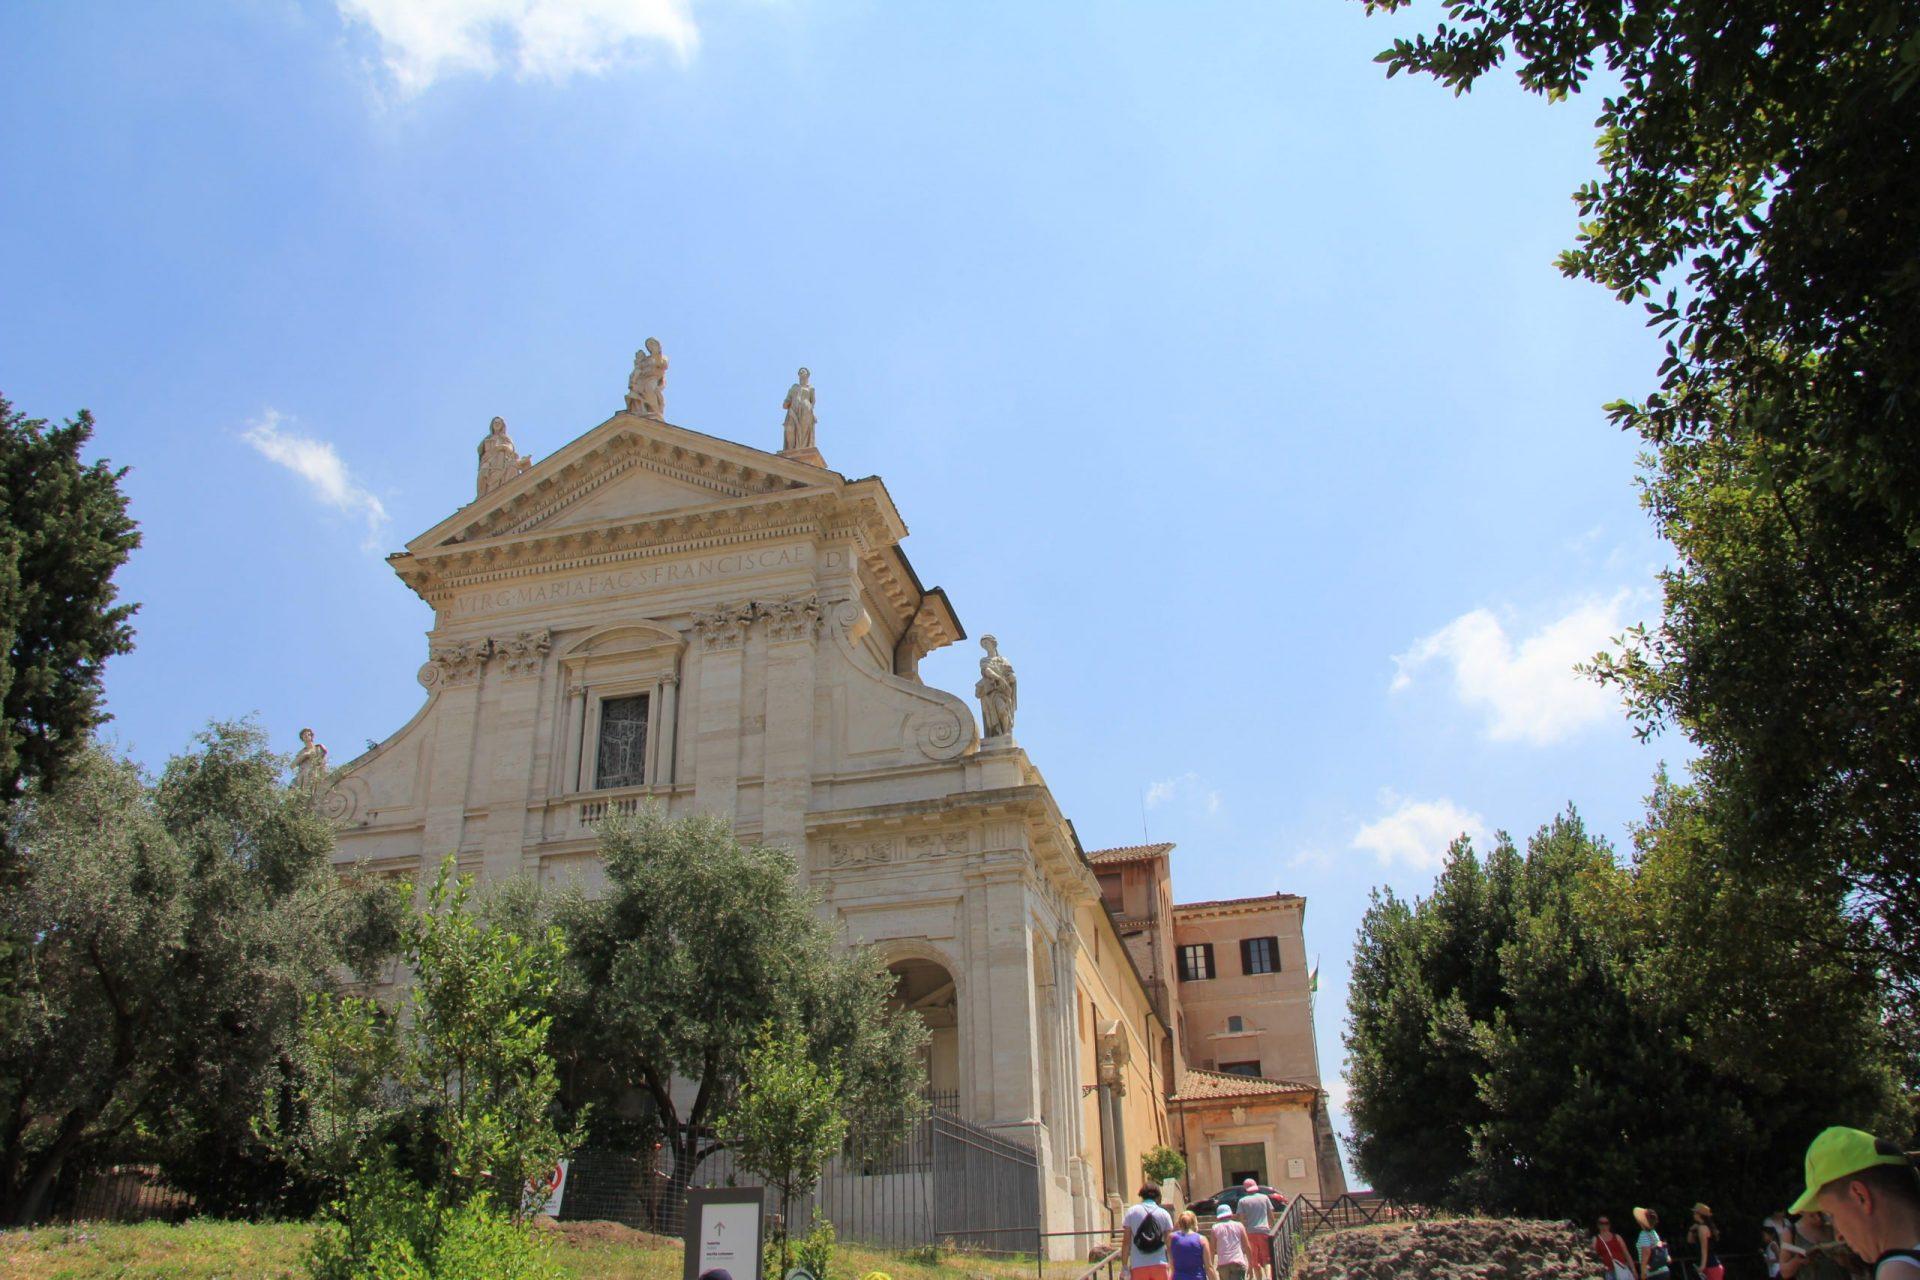 Санта-Франческа-Романа, Рим, Италия. Июль, 2012